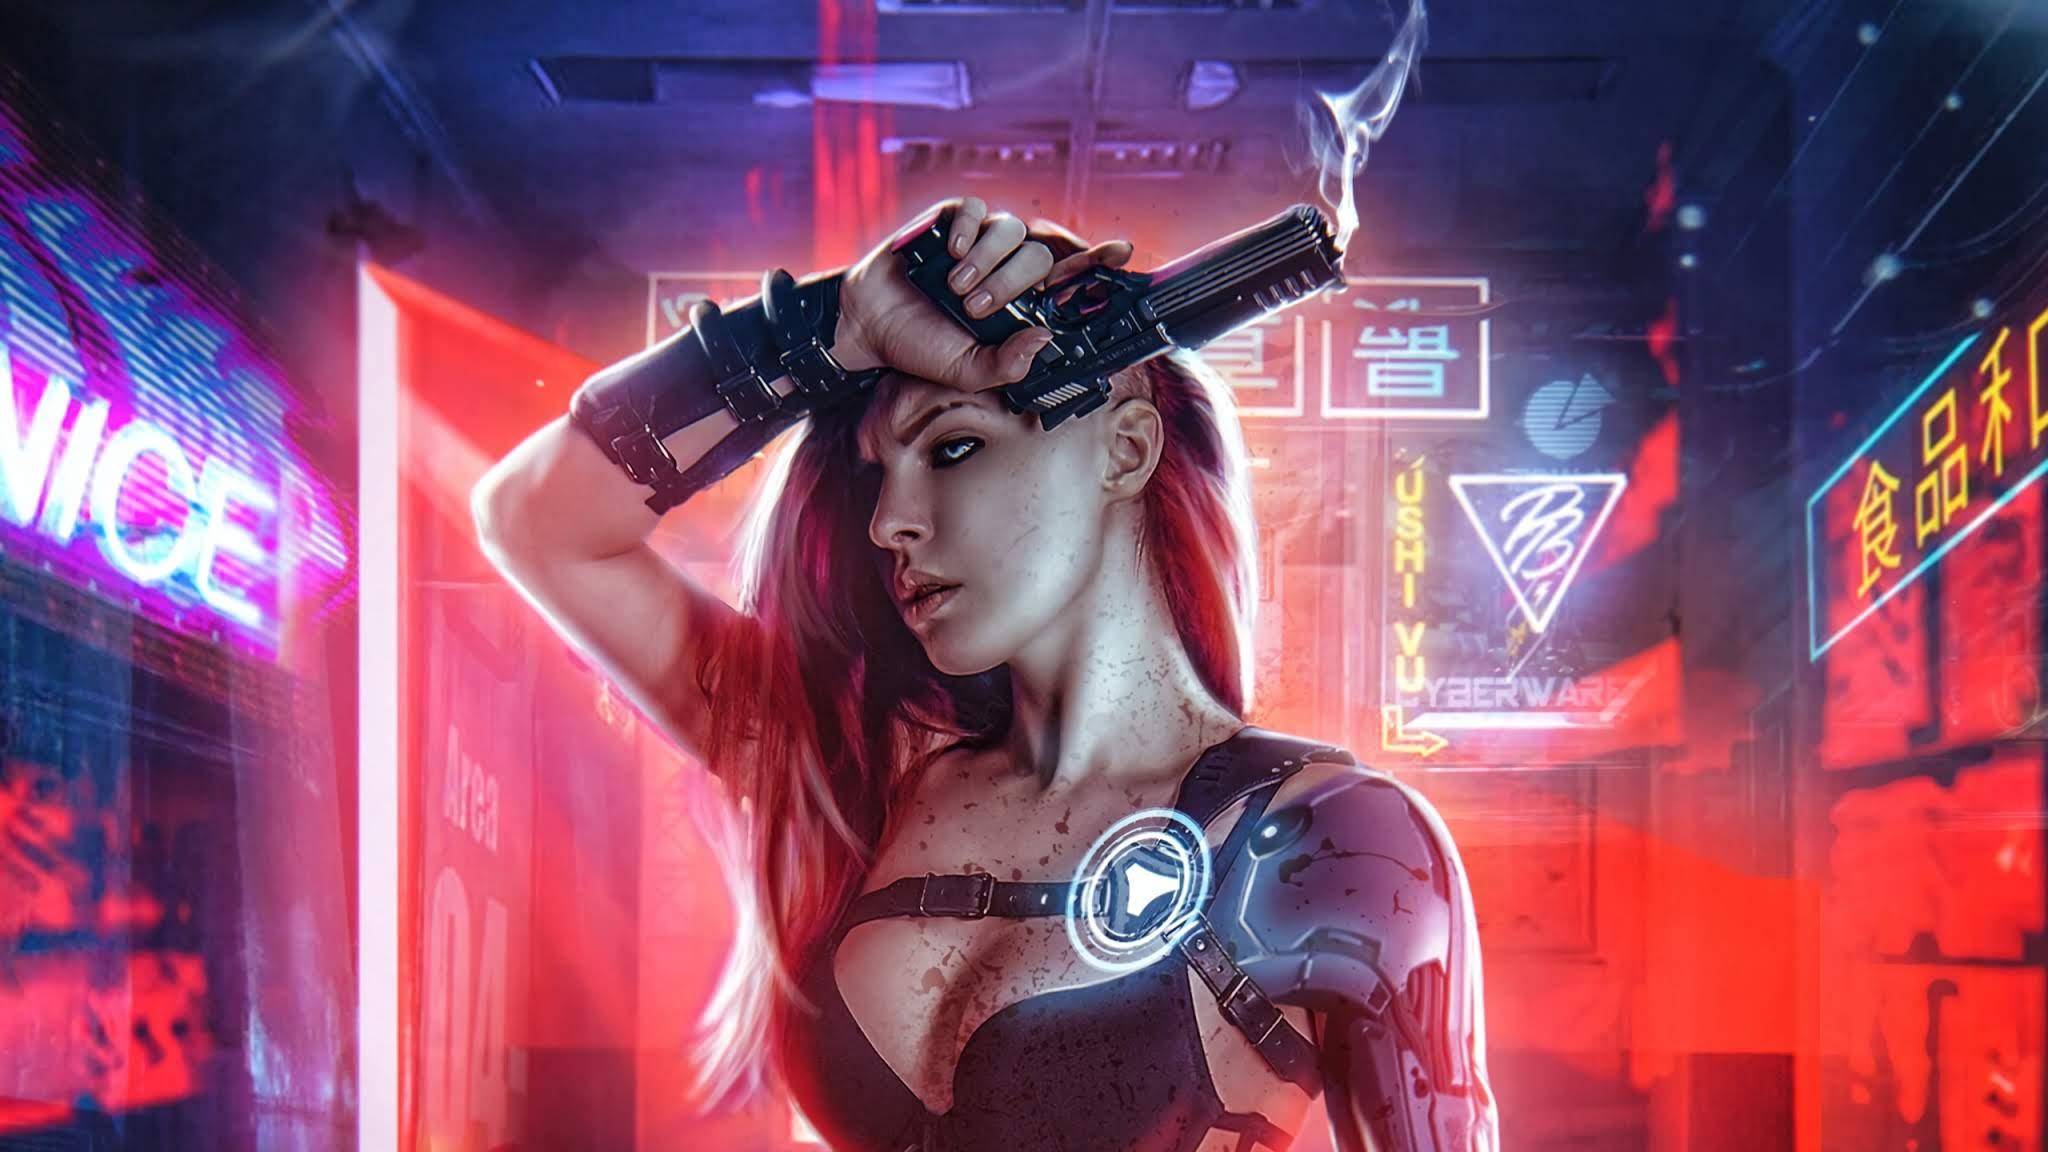 Cyberpunk Girl Wallpapers - Top Free Cyberpunk Girl ...